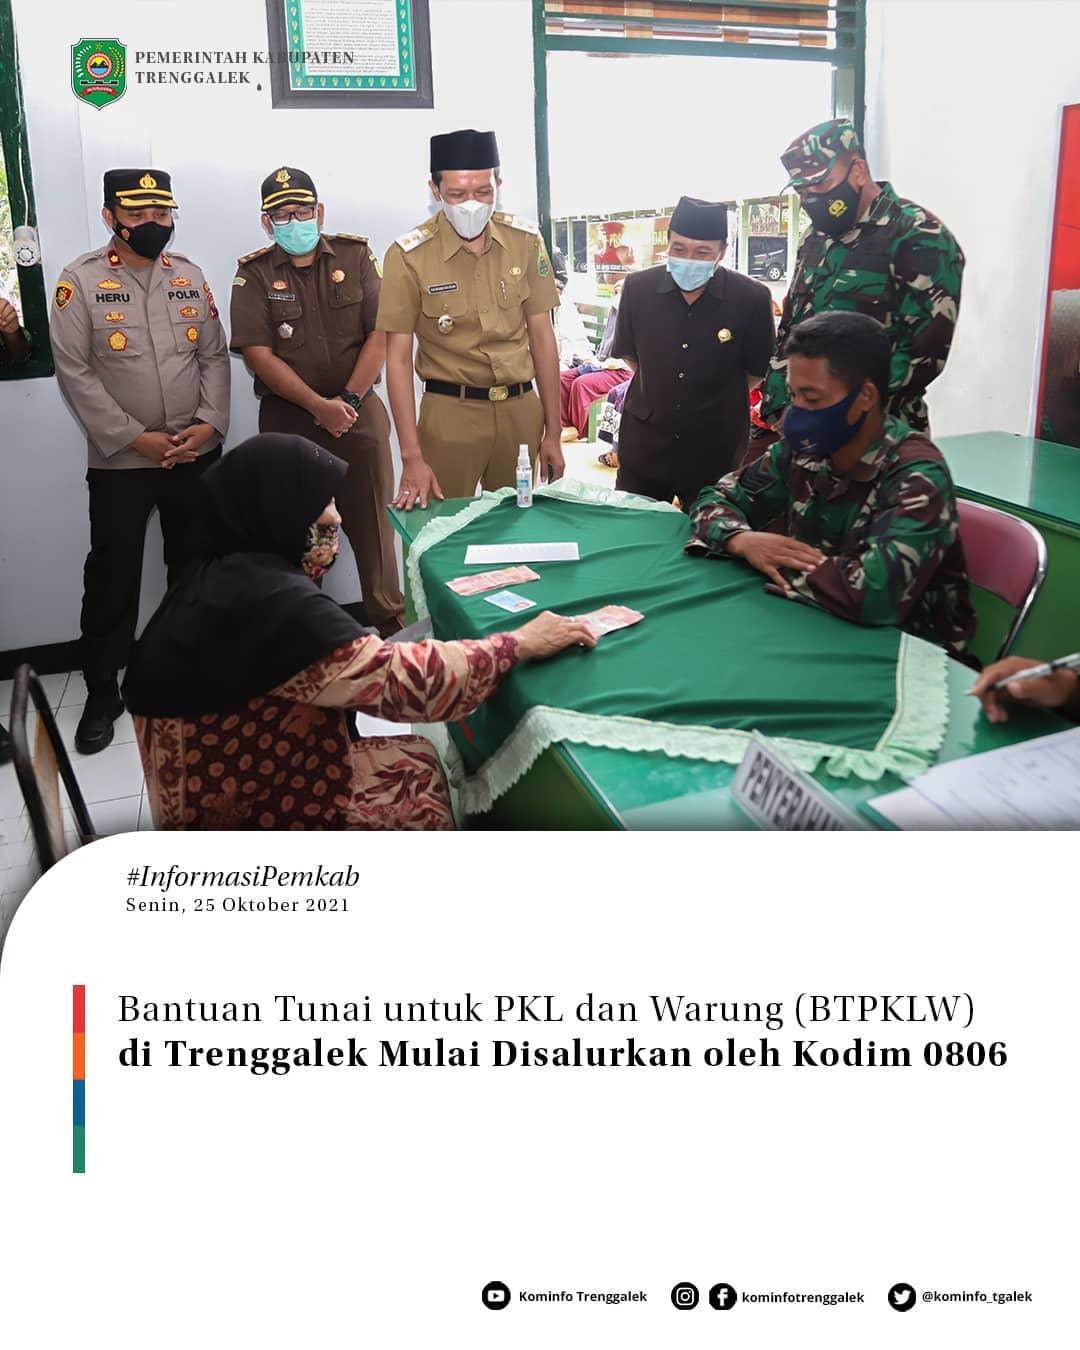 Bantuan Tunai Untuk PKL dan Warung (BTPKLW ) di Trenggalek Mulai di Trenggalek Oleh Kodim 0806